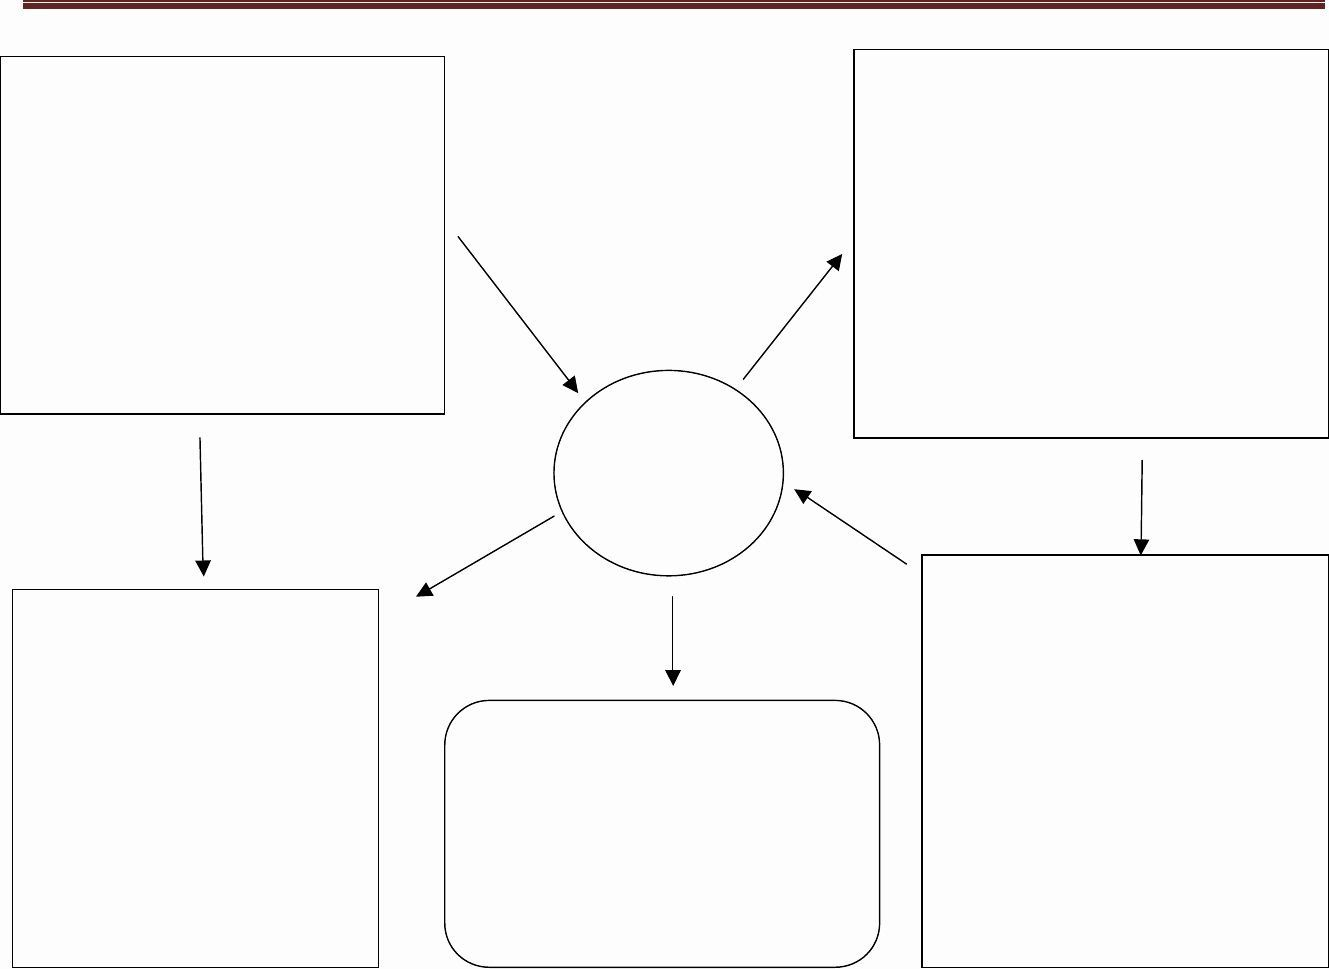 000 Wondrou Free Blank Concept Map Template Highest Clarity  Printable NursingFull